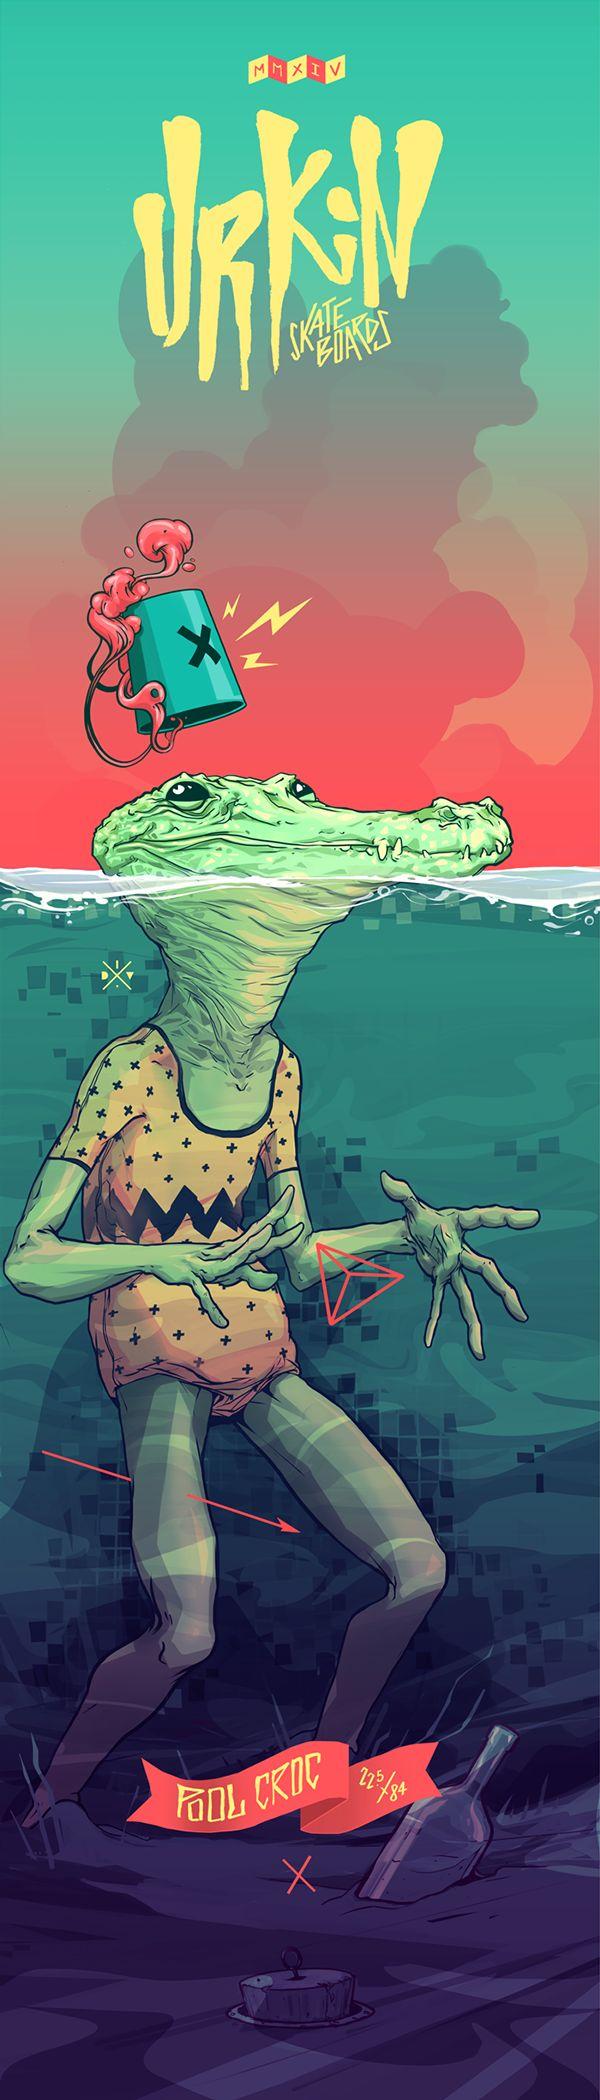 Urkin / Pool Croc by I . D .  V ., via Behance